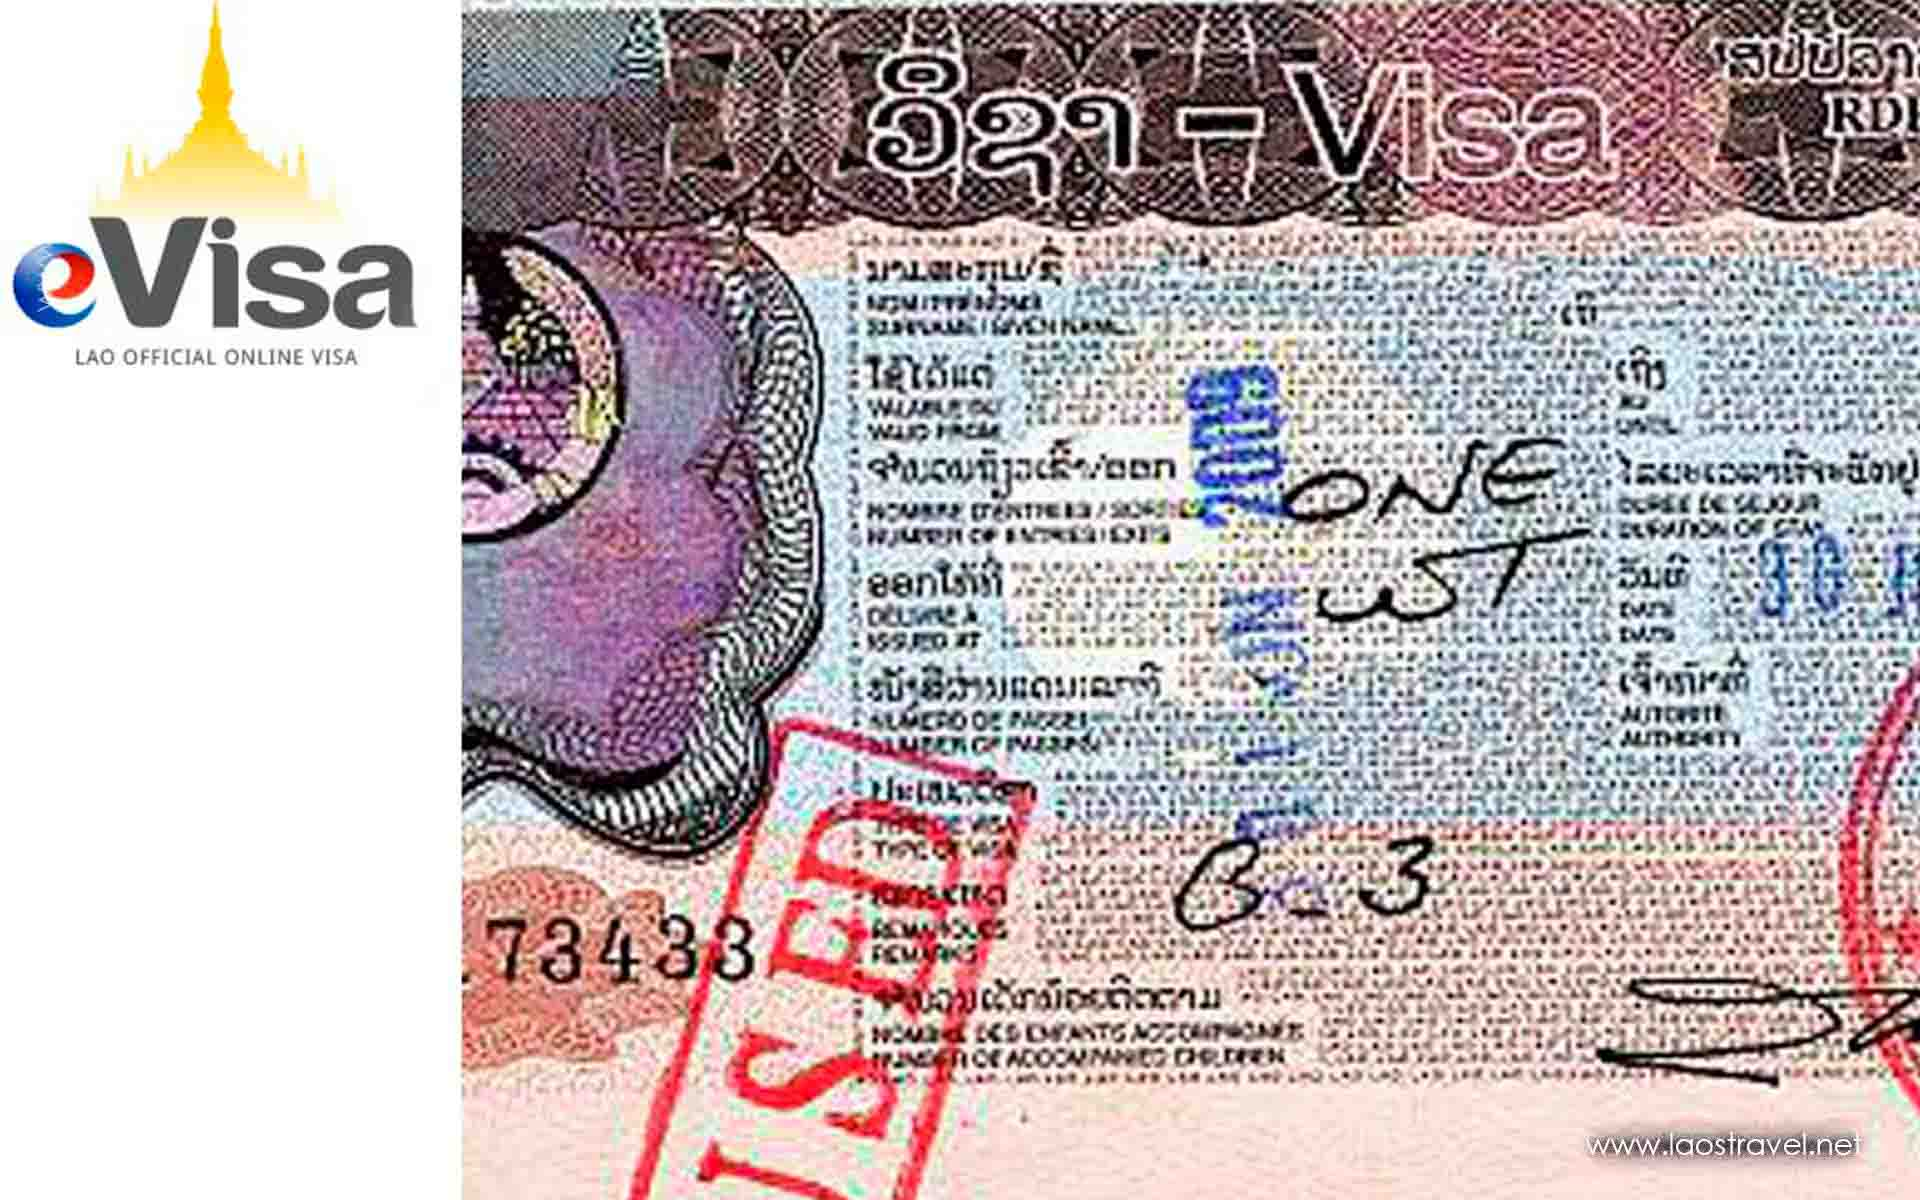 Laos E Visa 2020 Laos Tourist Visa Online Laos Travel